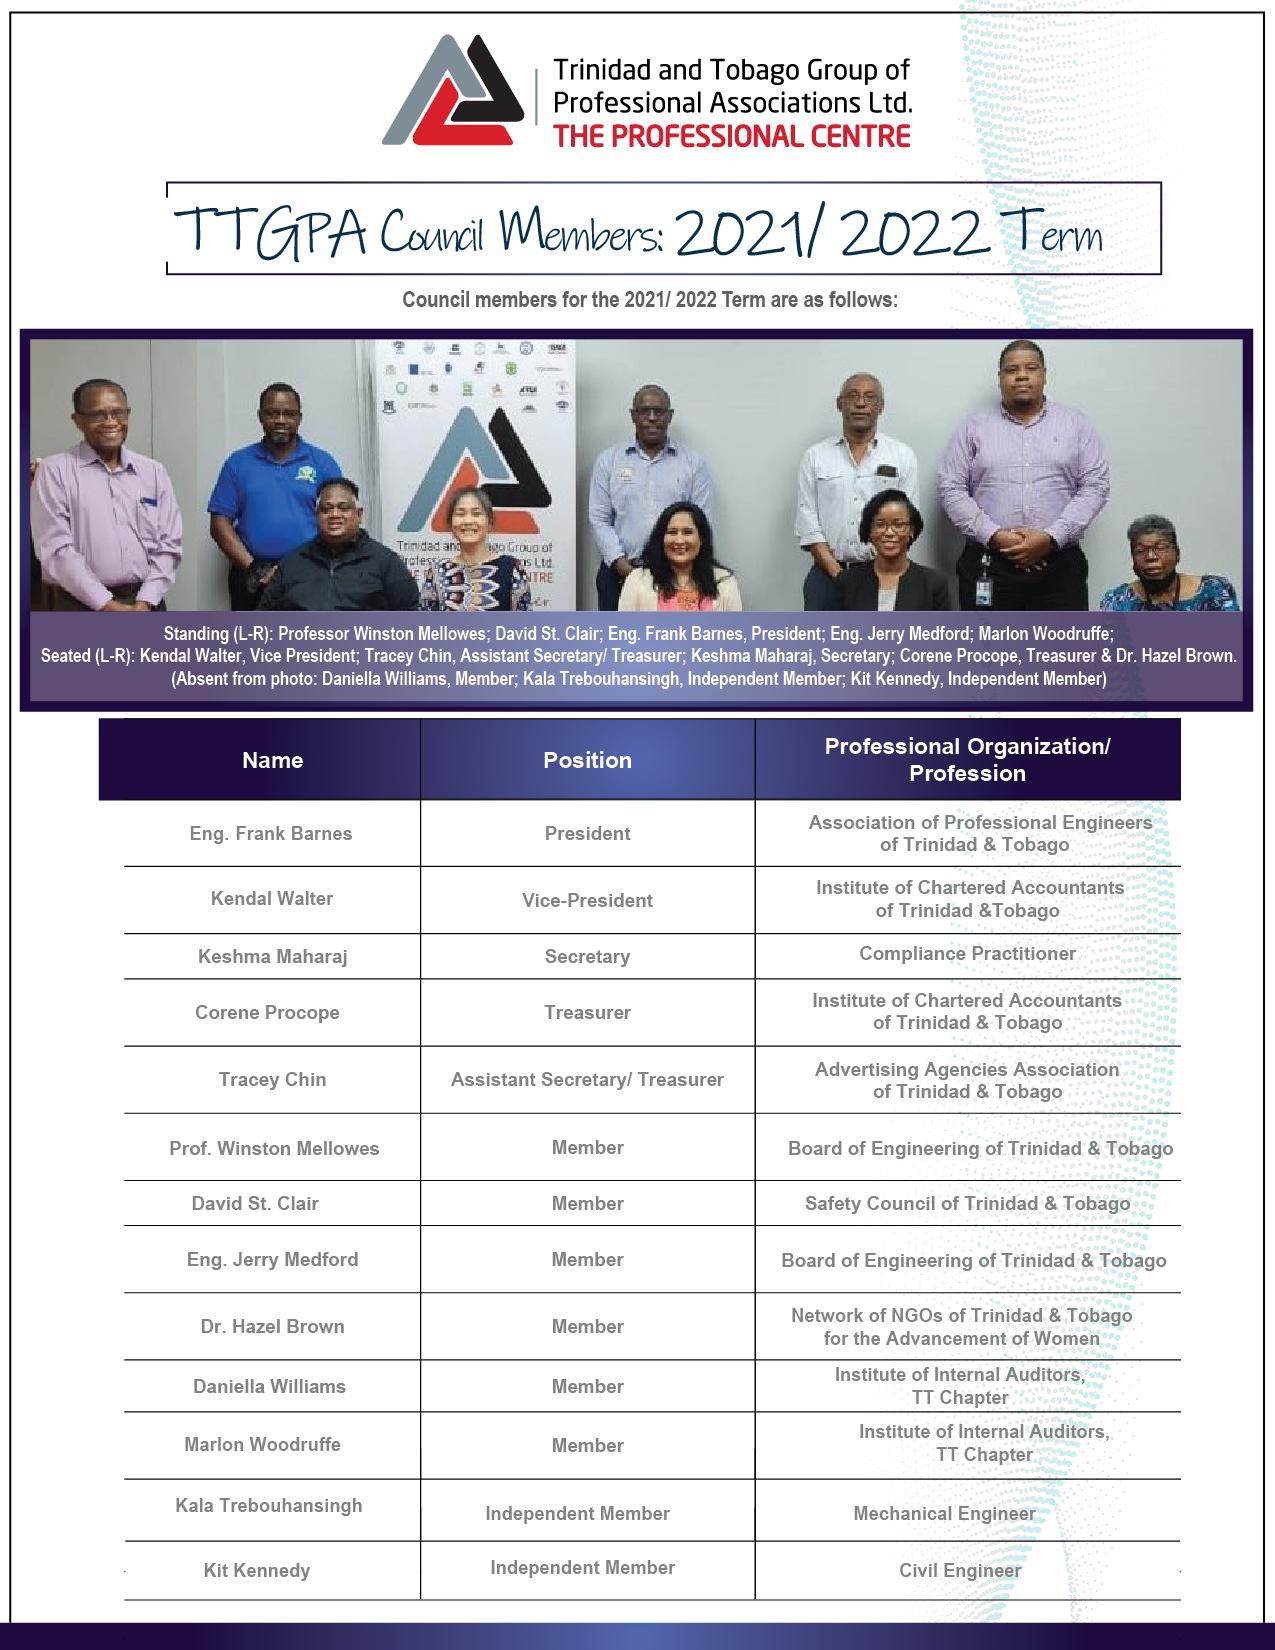 TTGPA Council 2021 2022 Term-01-01